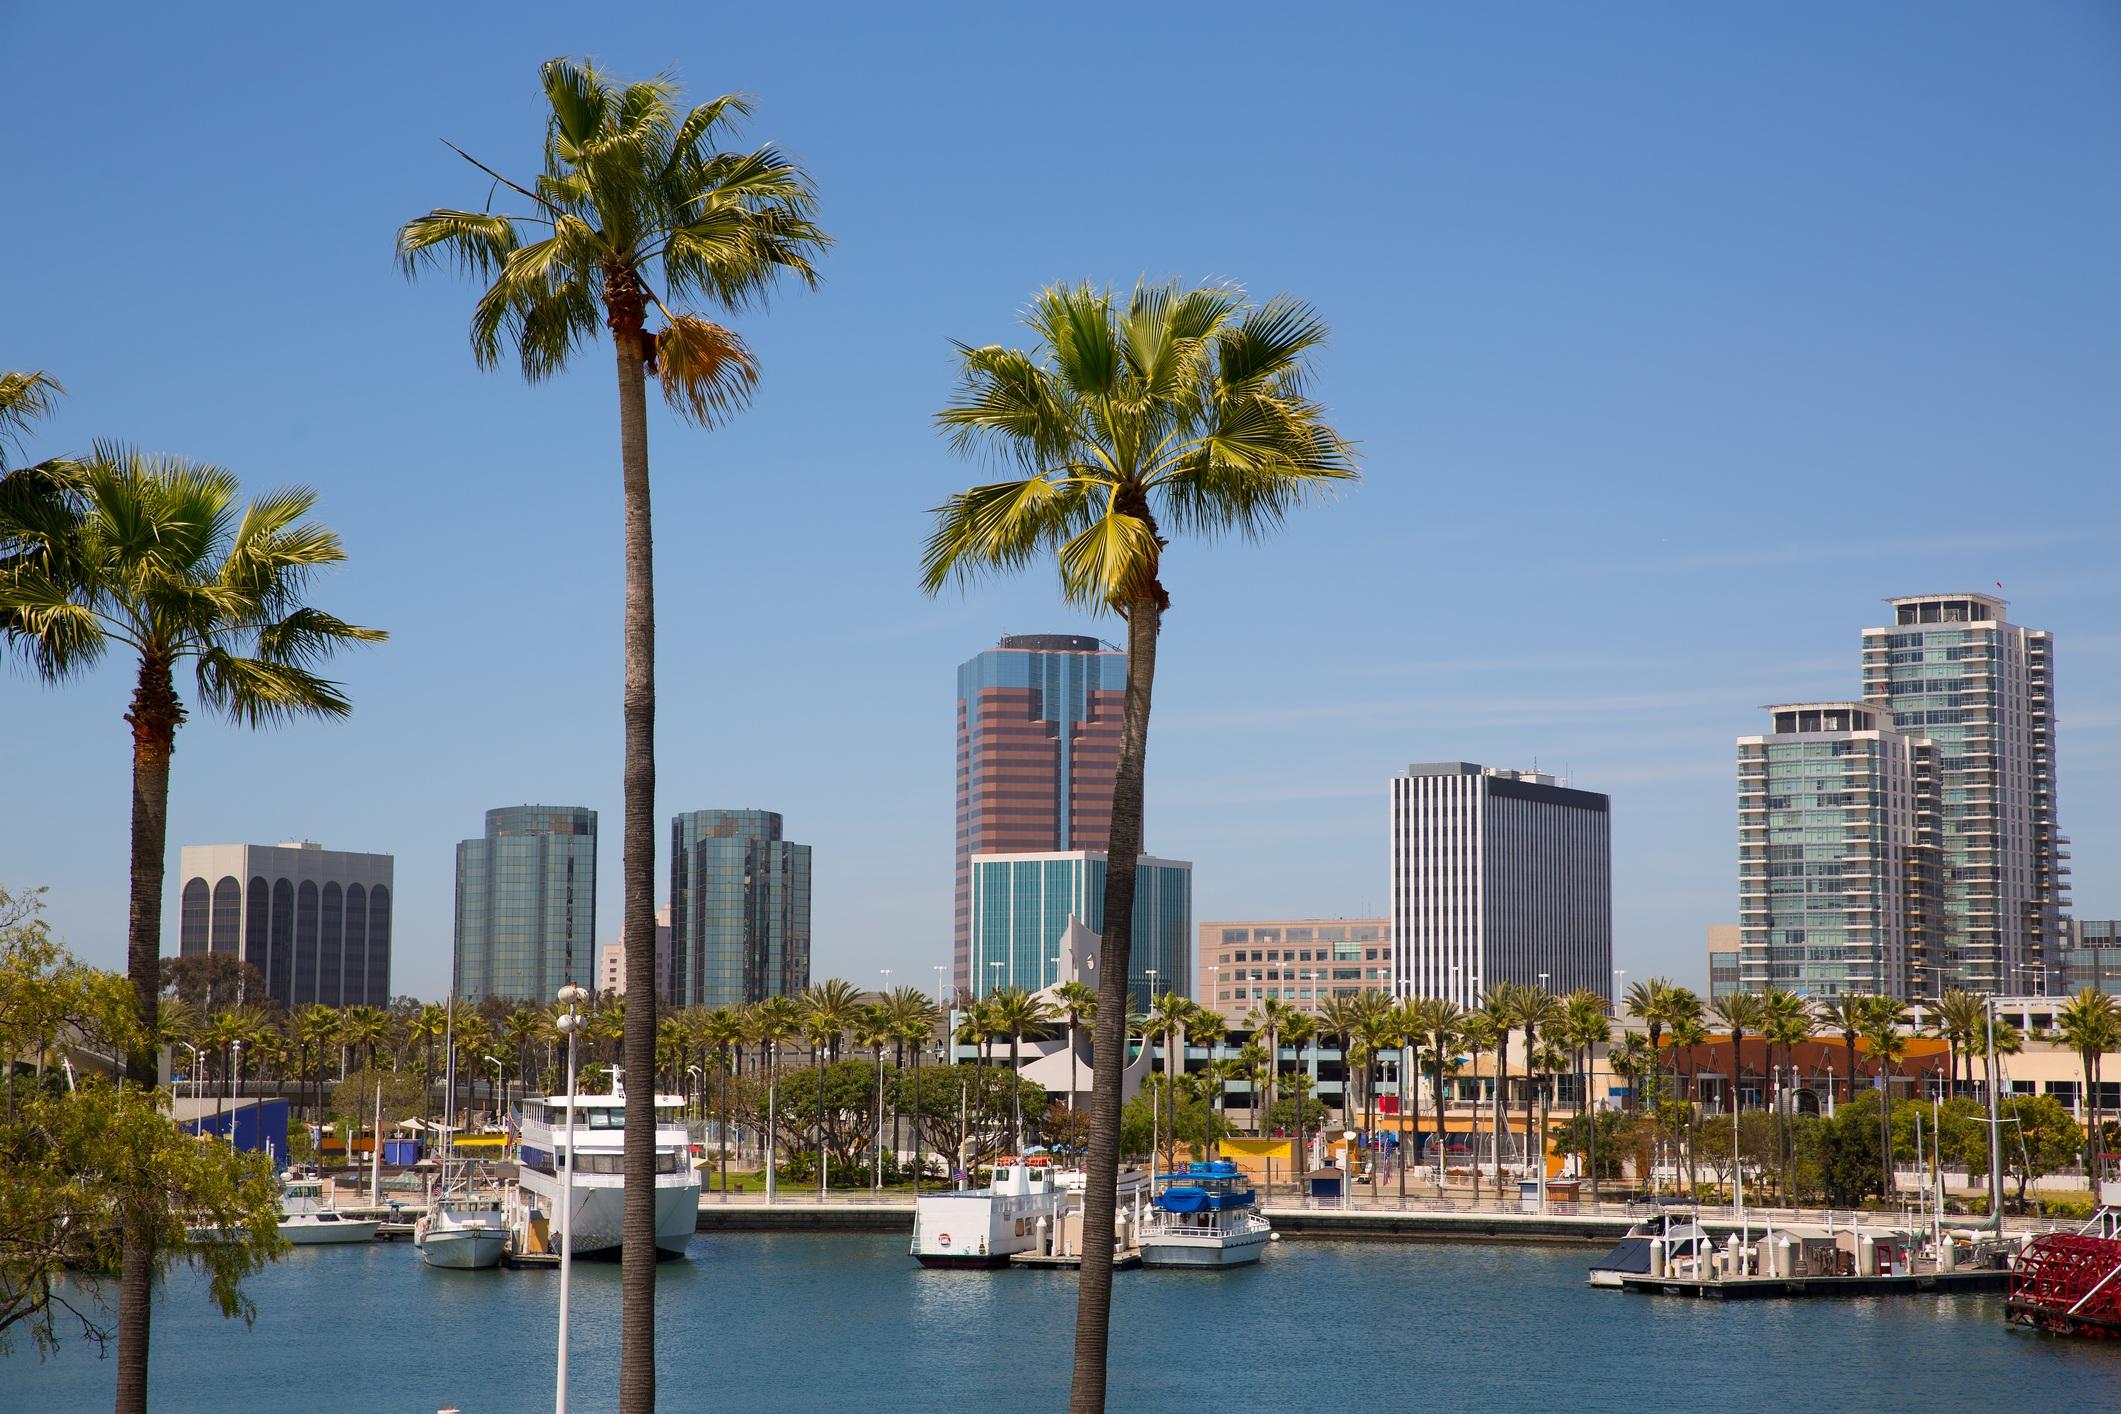 Long Beach, California